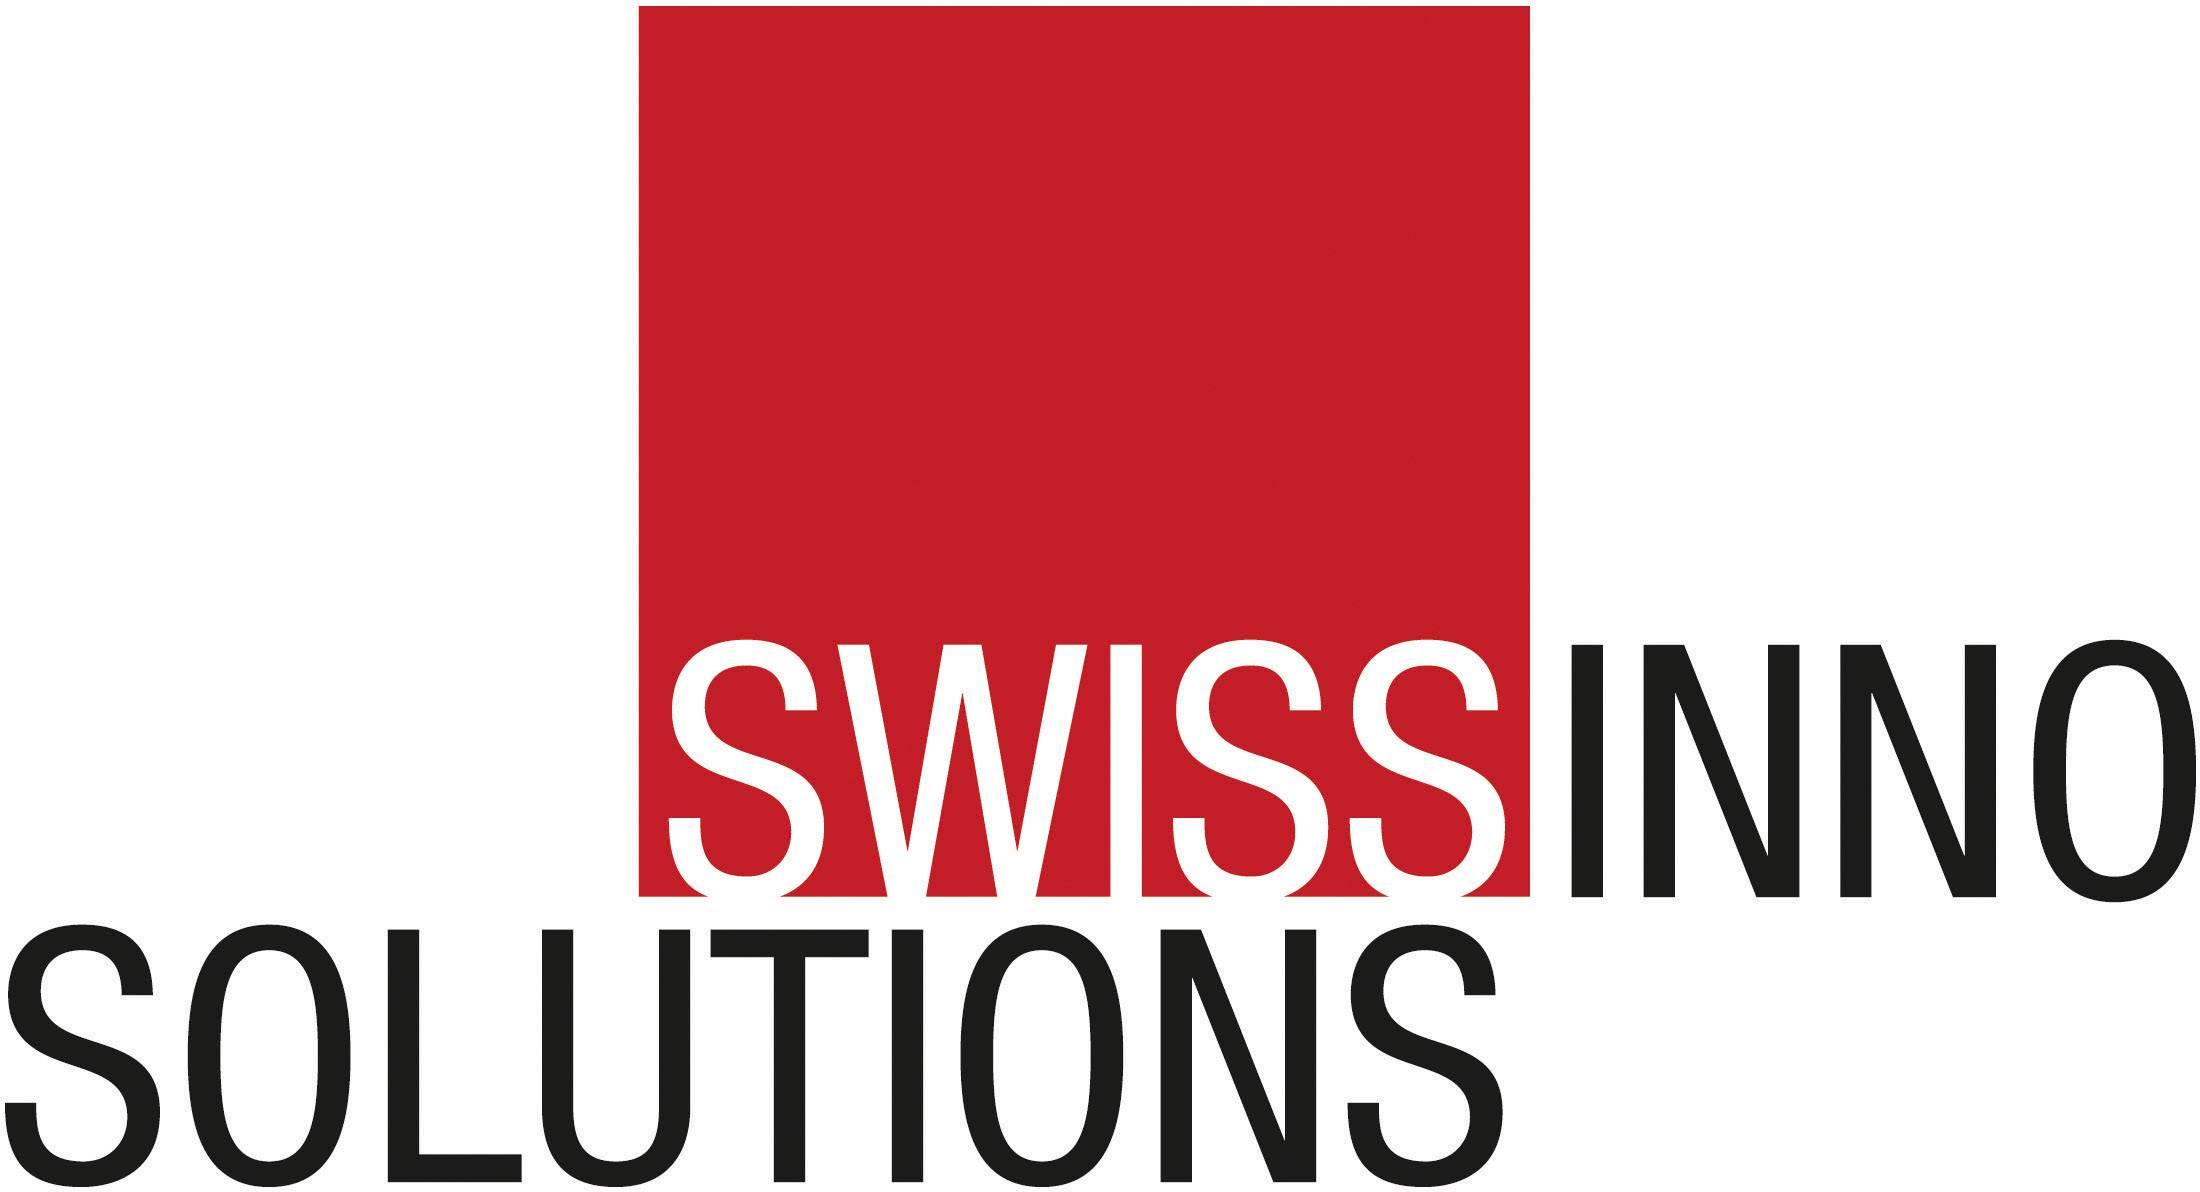 SWISSinno SOLUTION